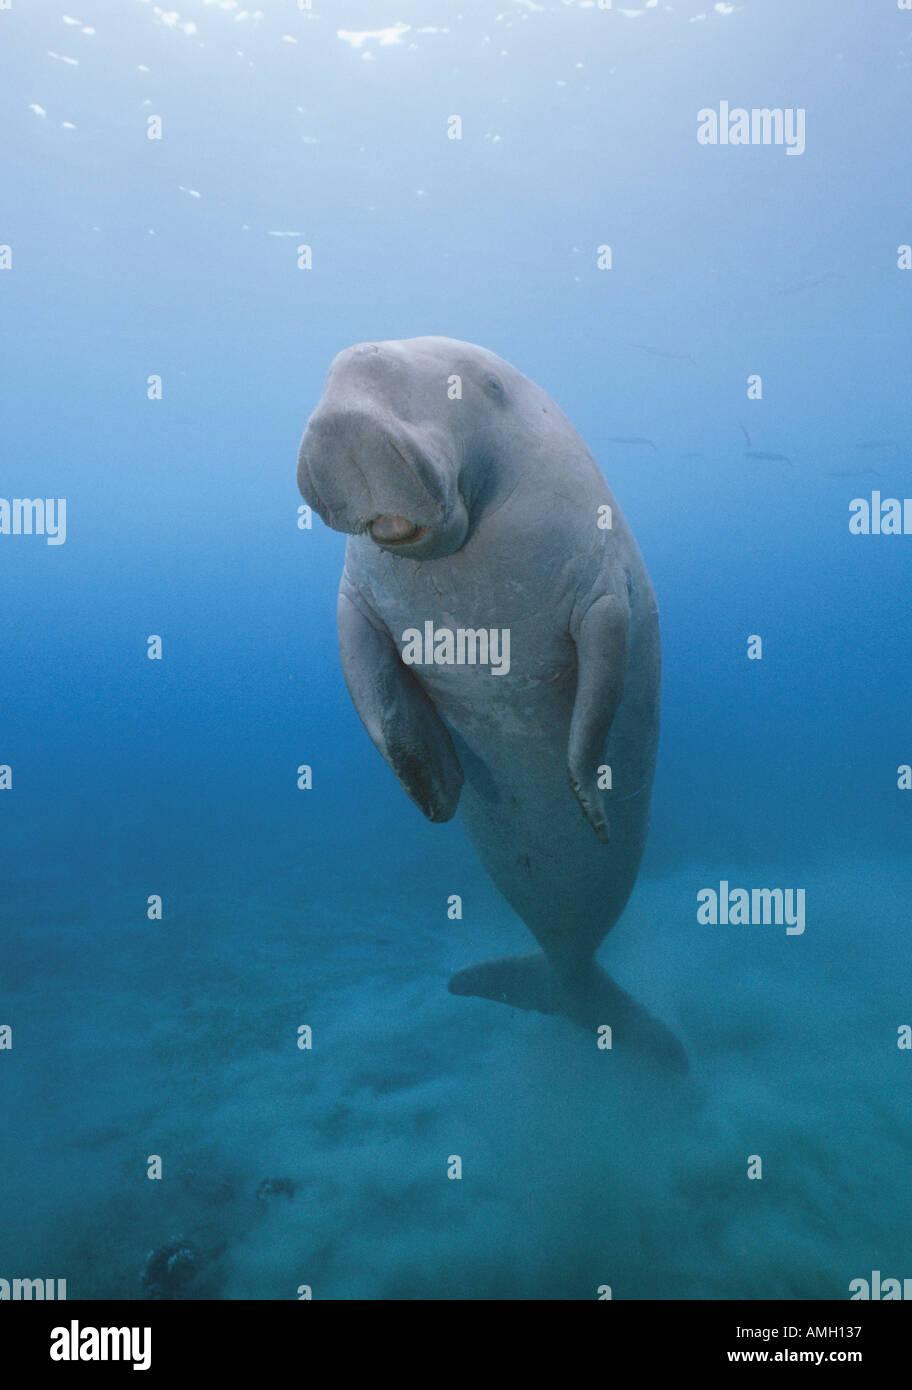 Dugong Mermaid Legend